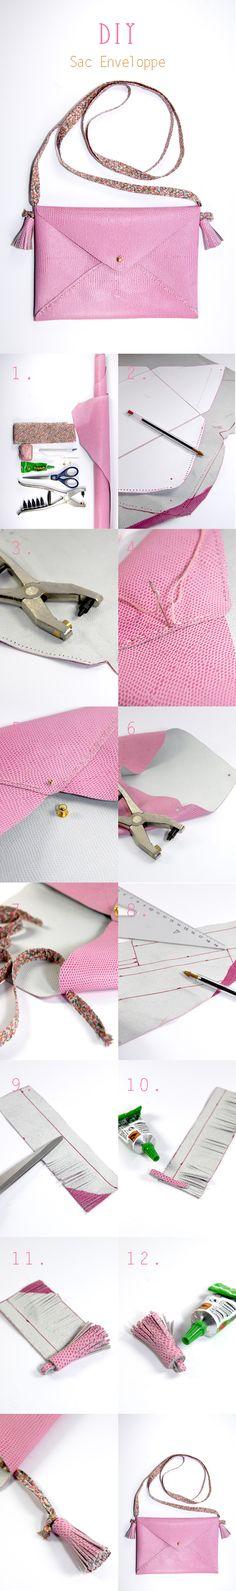 DIY envelope clutch ♥